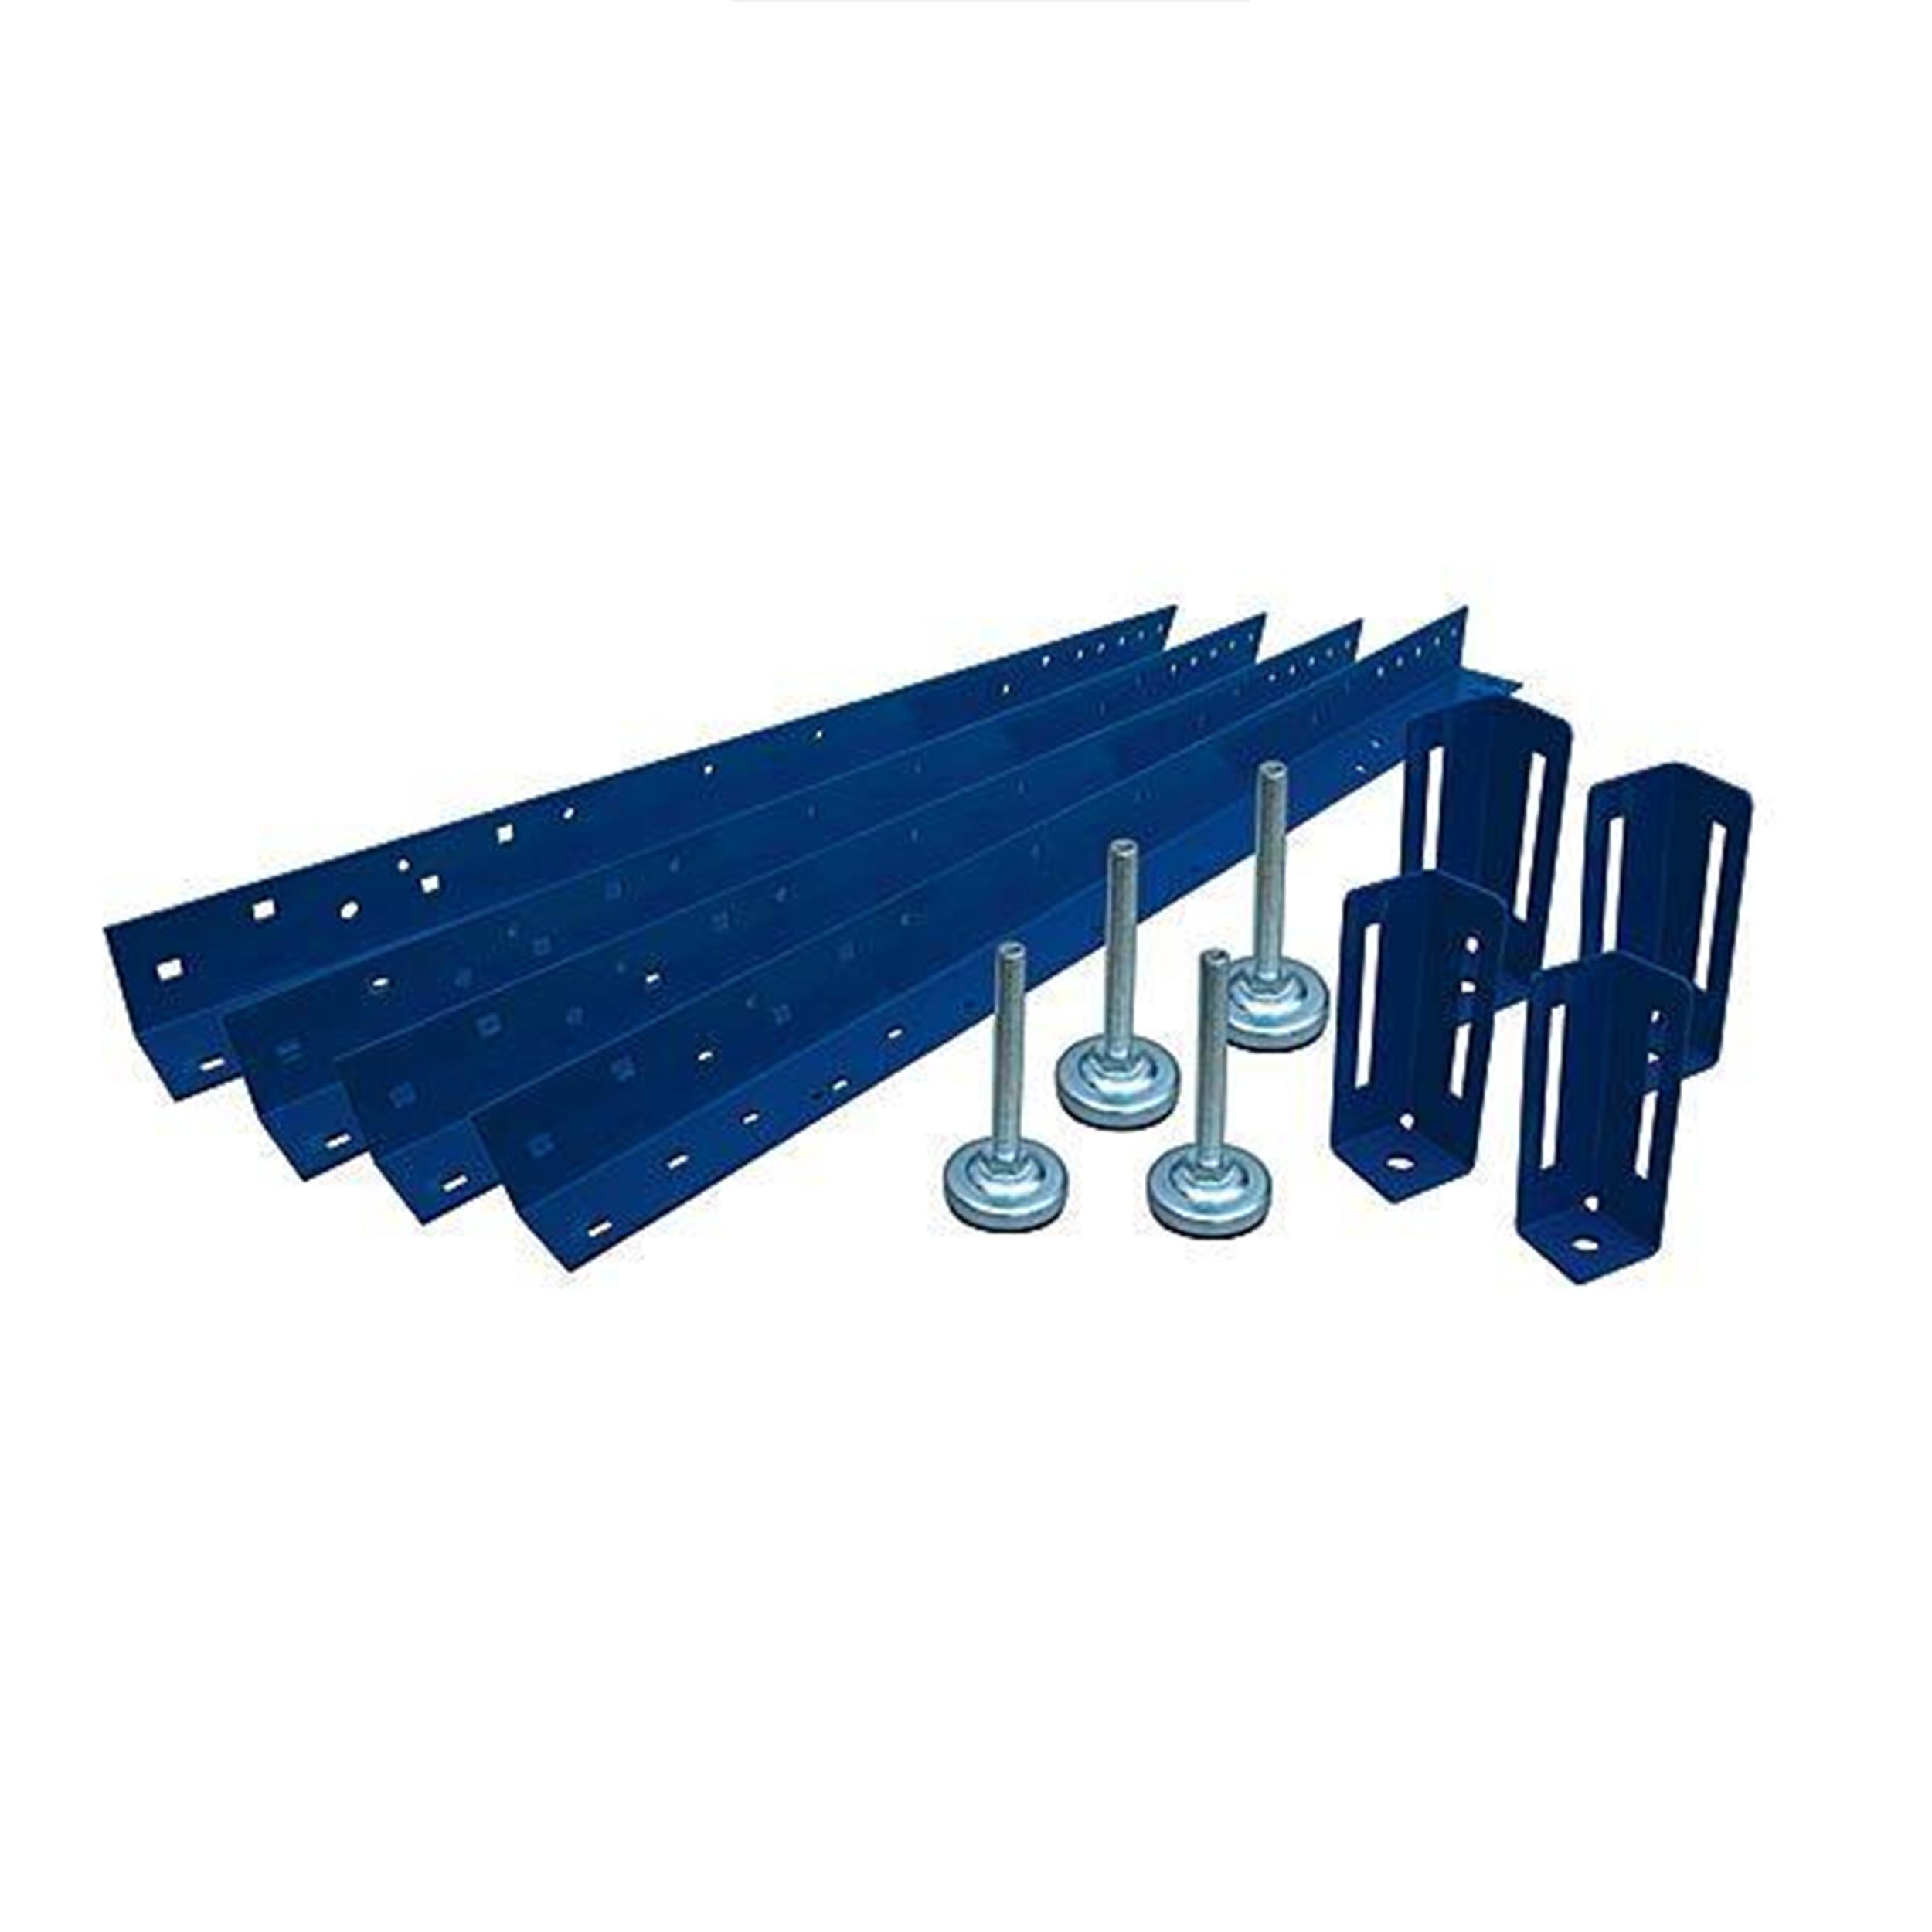 Universal Bench 31-Inch 4-Piece Leg Set,  #KBS1000